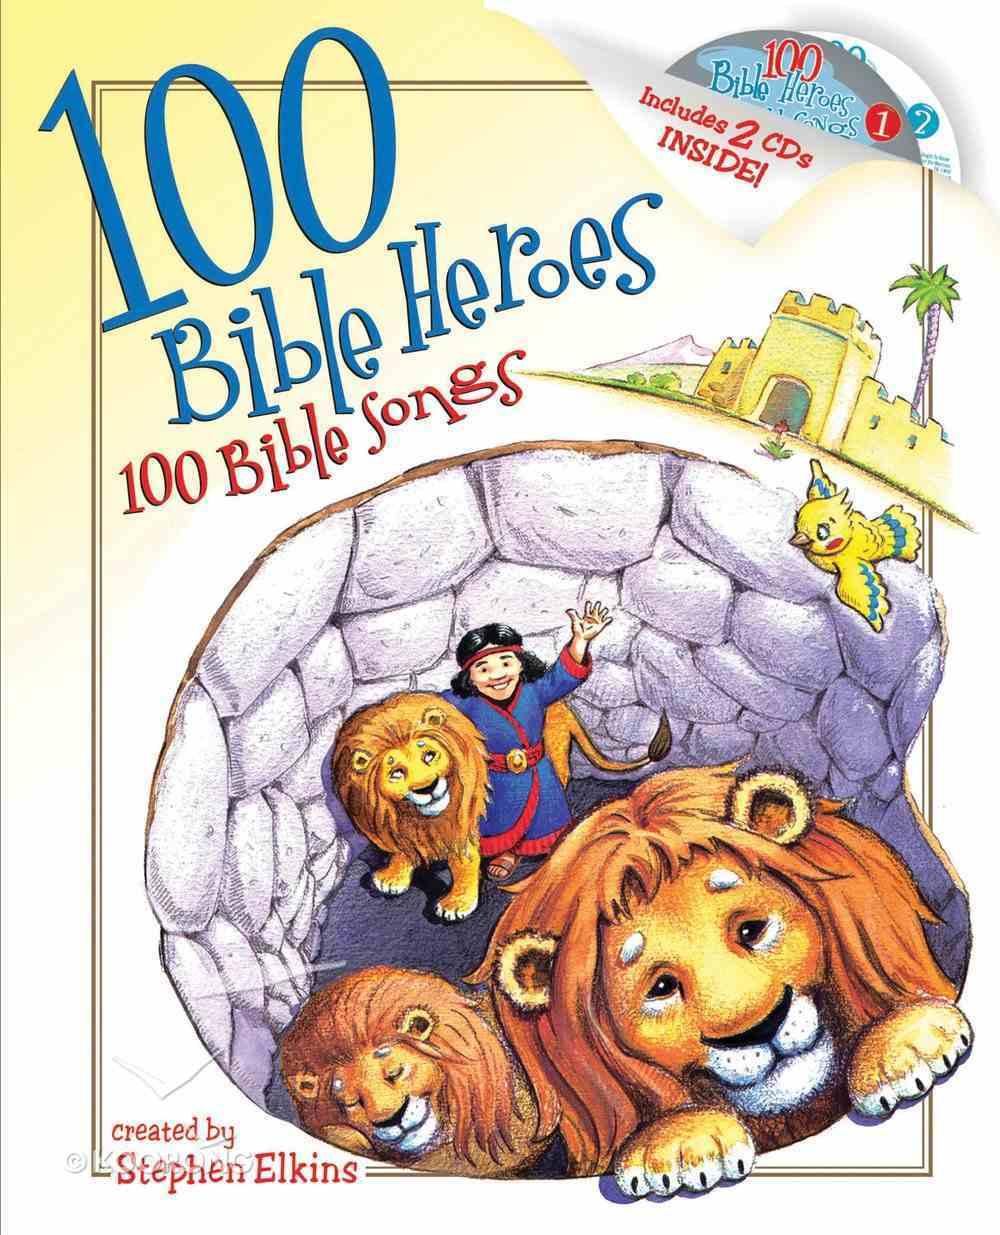 100 Bible Heroes, 100 Bible Songs eBook